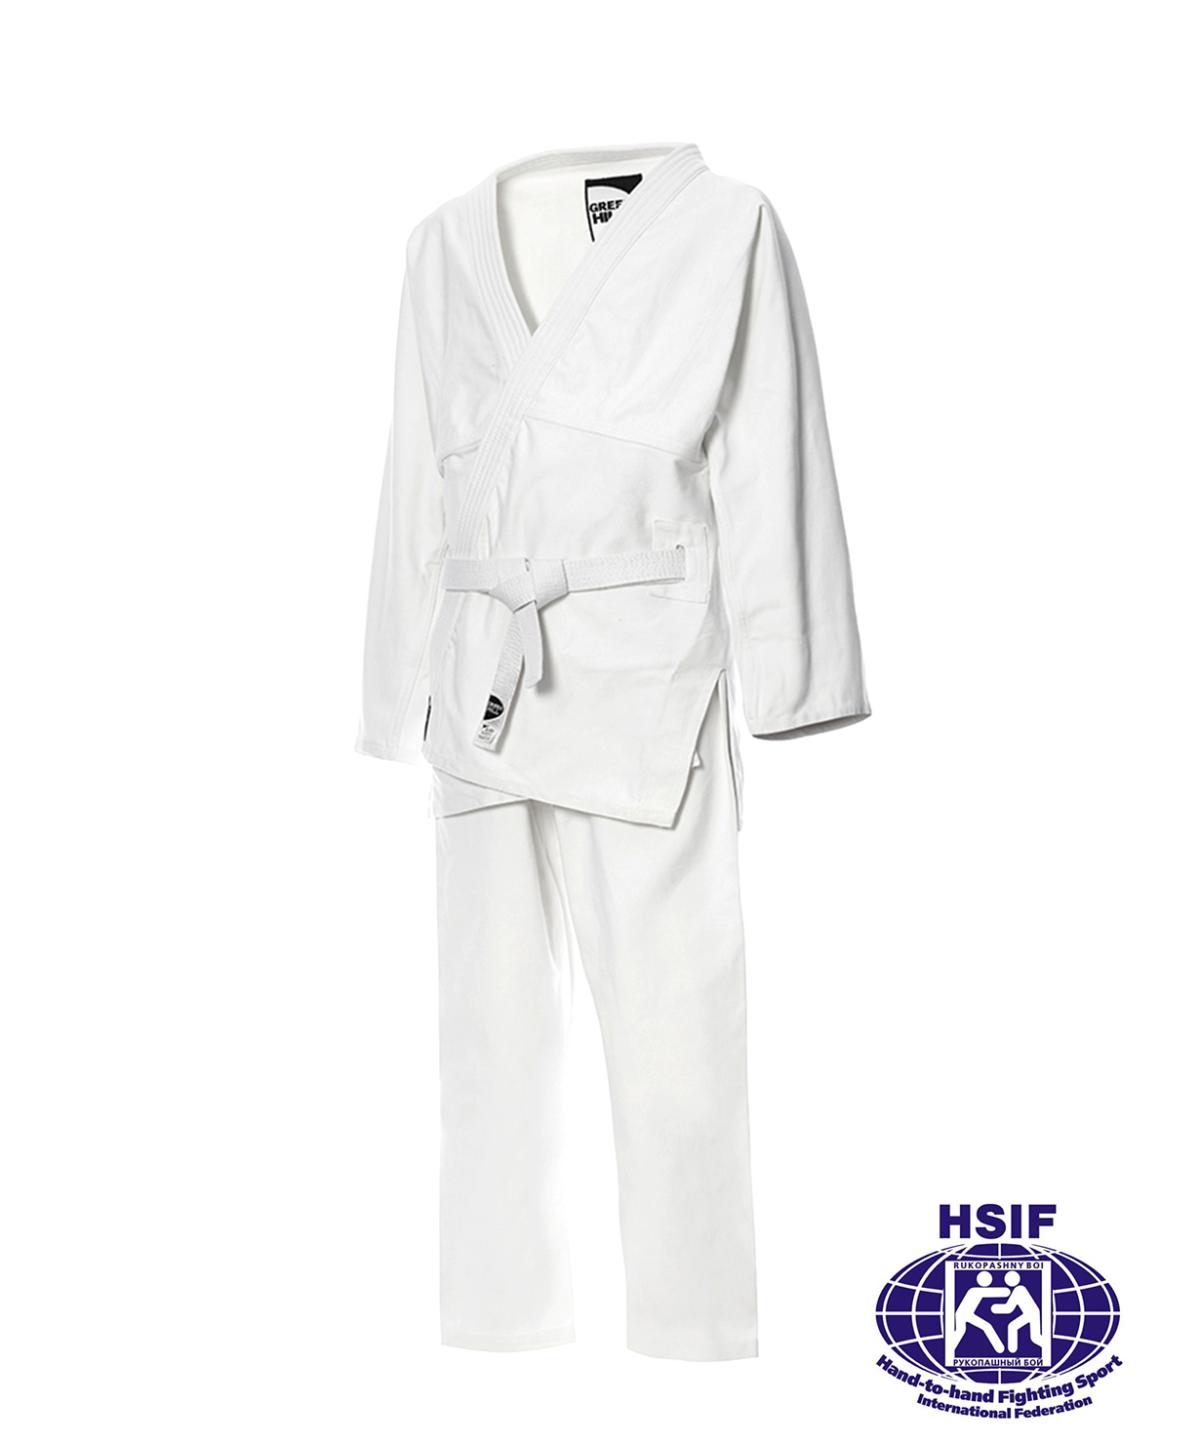 GREEN HILL Кимоно для рукопашного боя р.00/120 Junior  SHH-2210 - 1